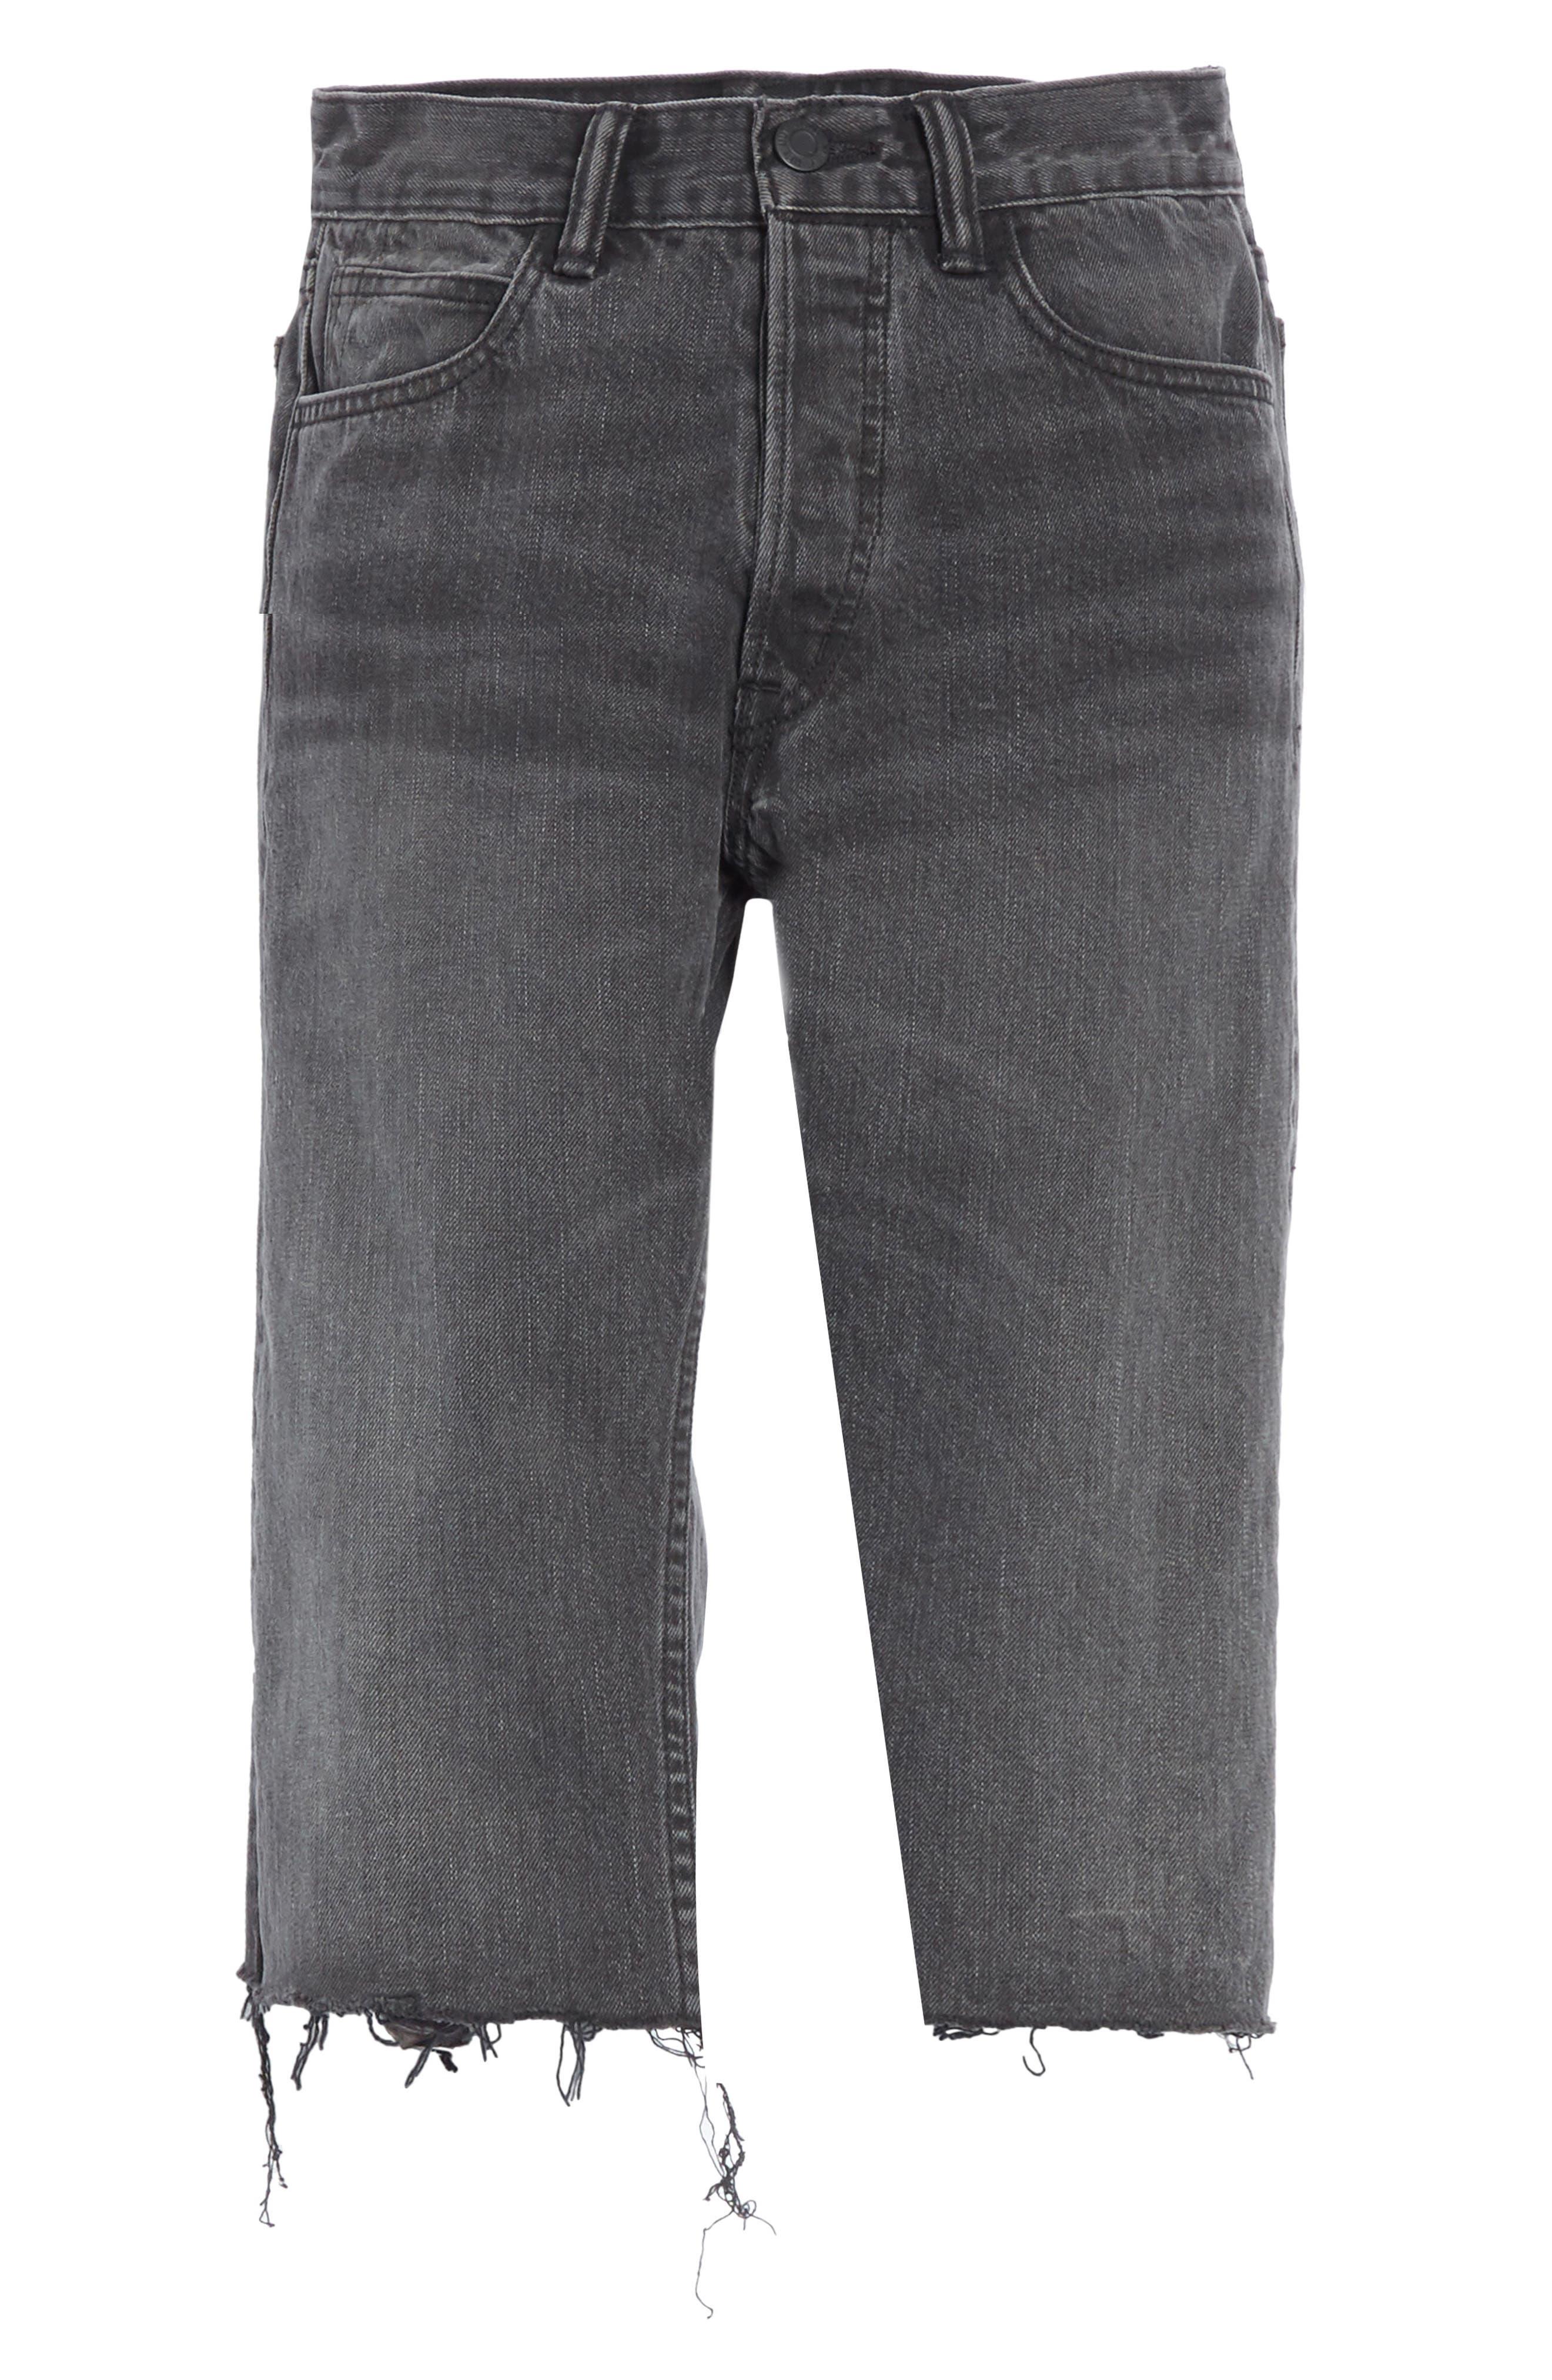 Cutoff Knee Length Denim Shorts,                             Alternate thumbnail 6, color,